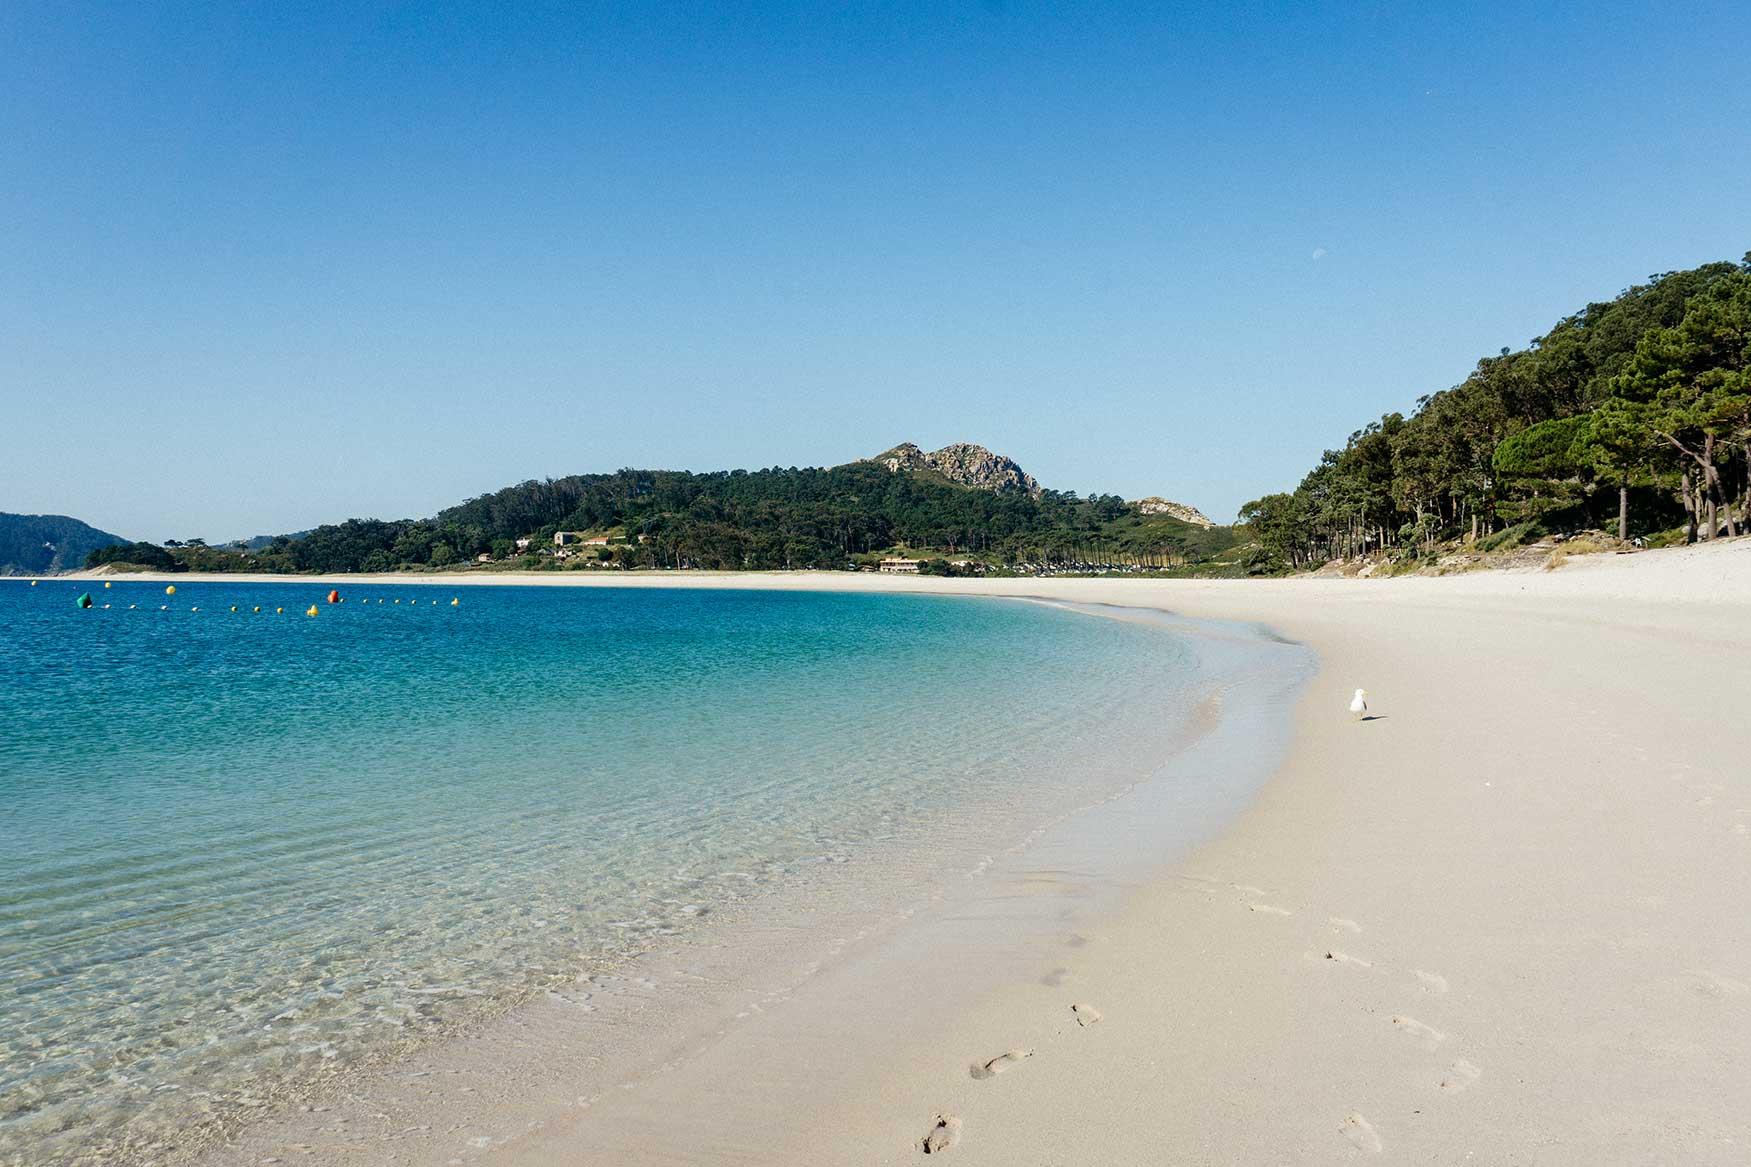 Praia de Rodas (Islas Cíes)